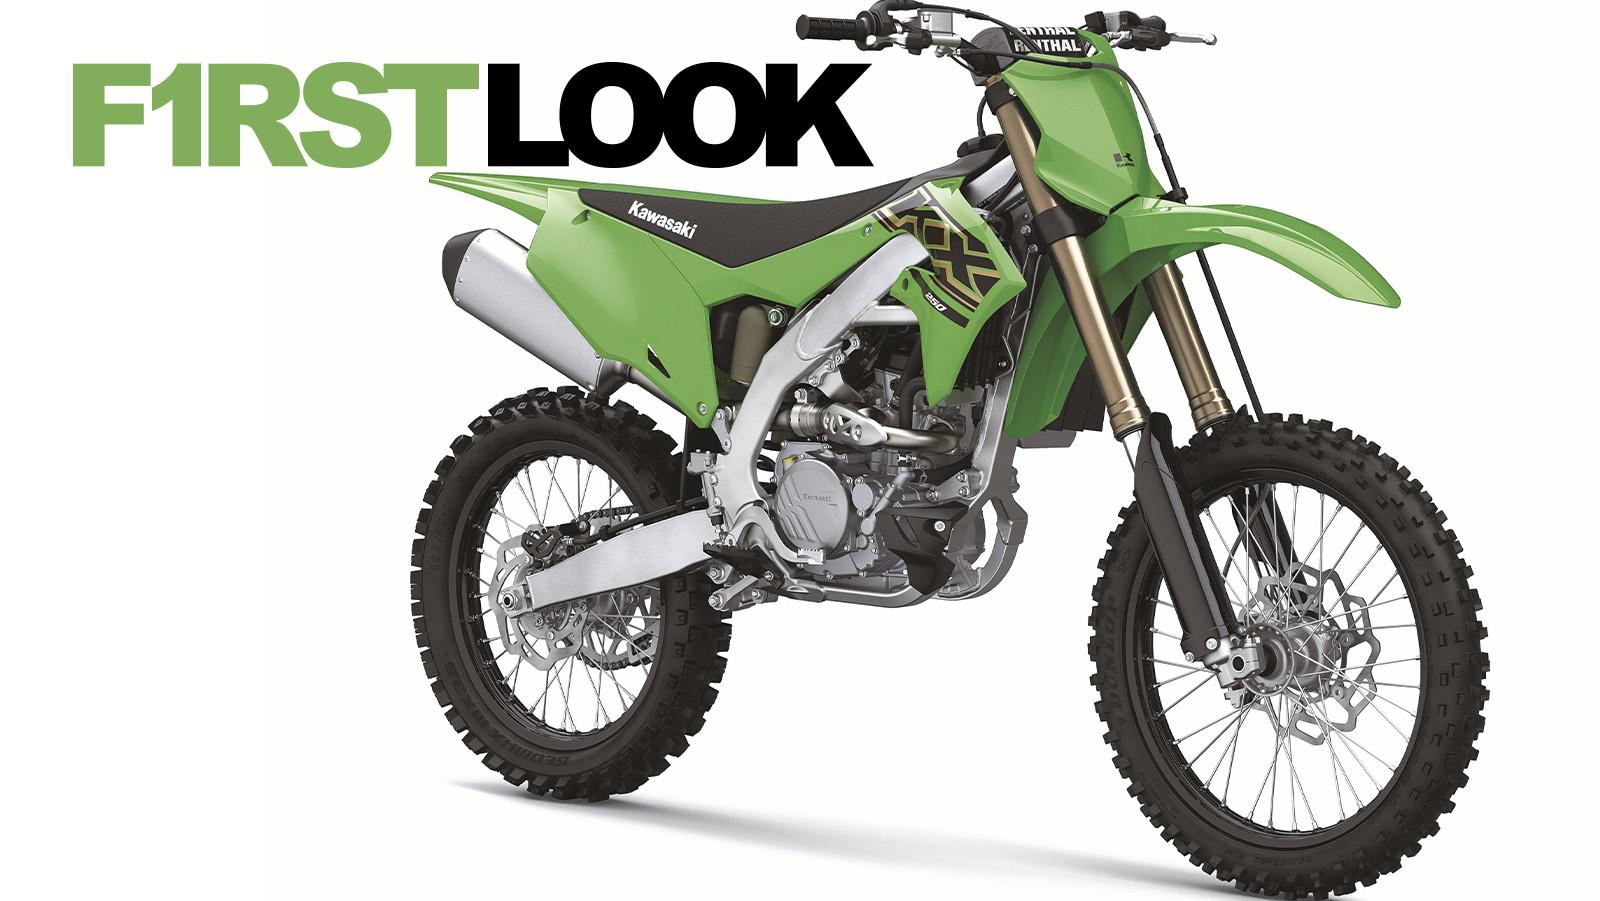 First Look: 2021 Kawasaki Motocross and Cross Country Bikes